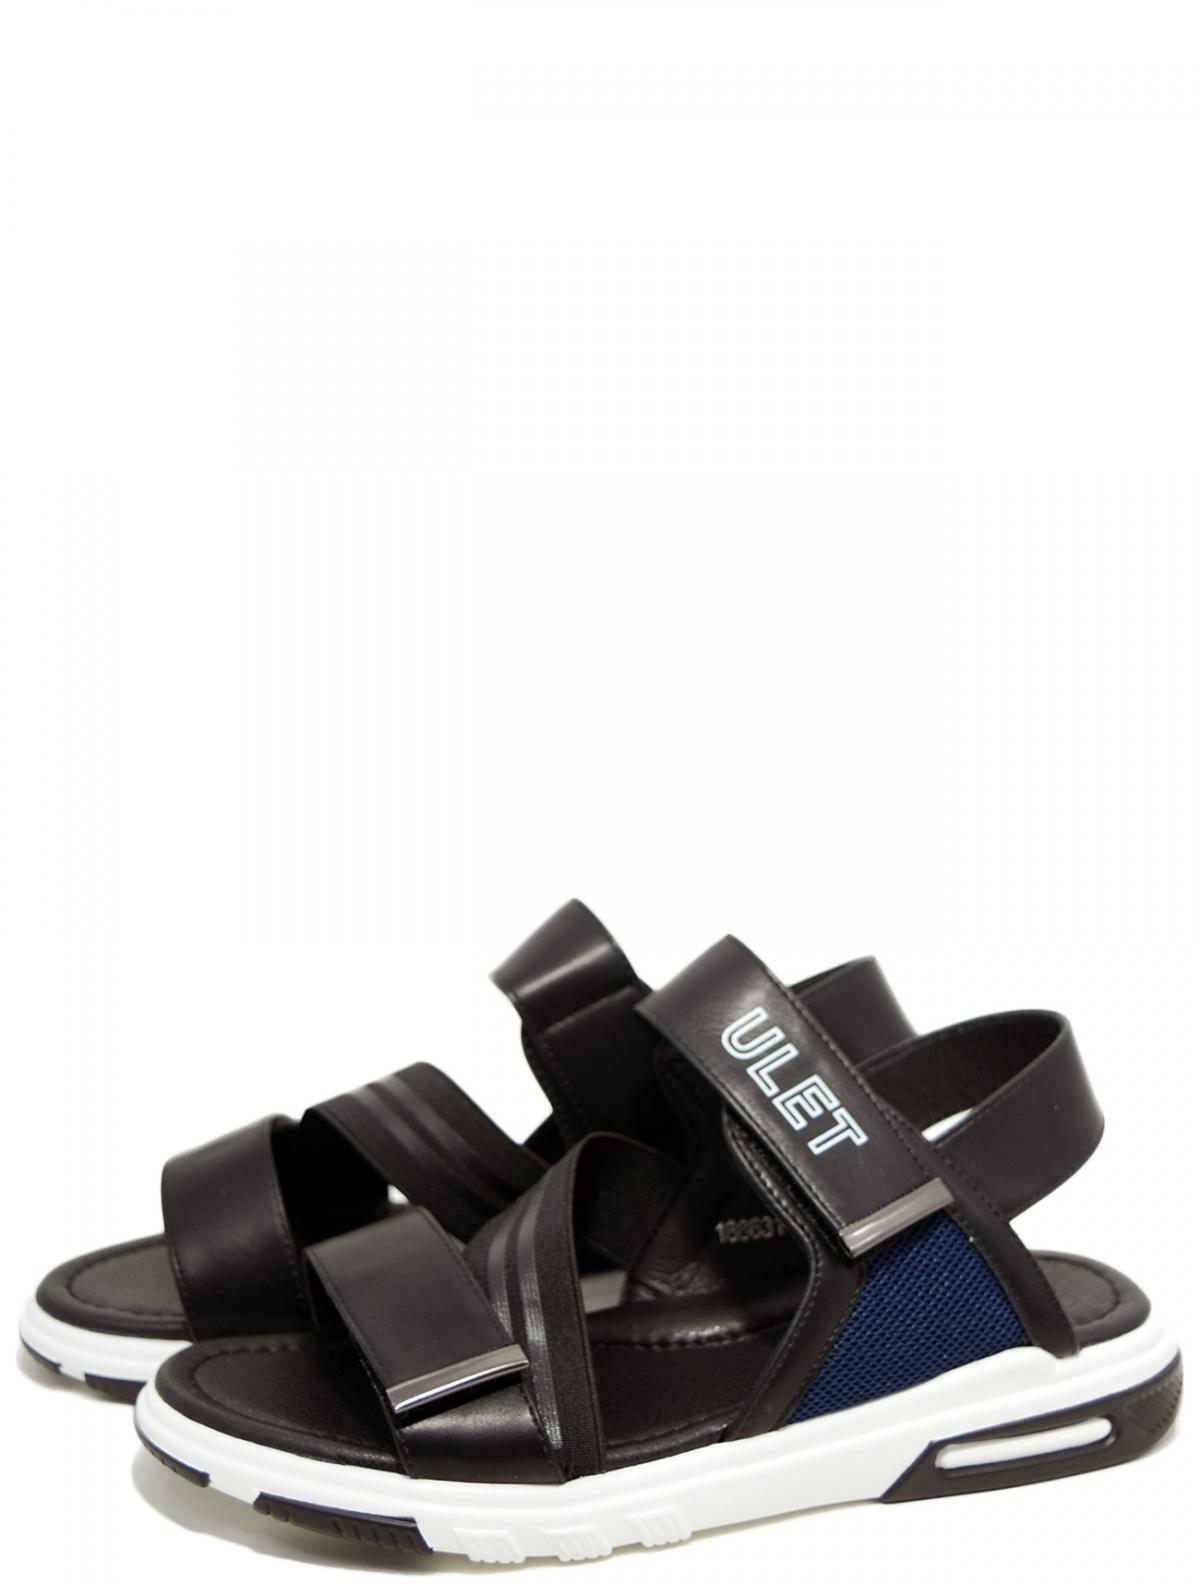 Ulet 188631-0701 сандали для мальчика